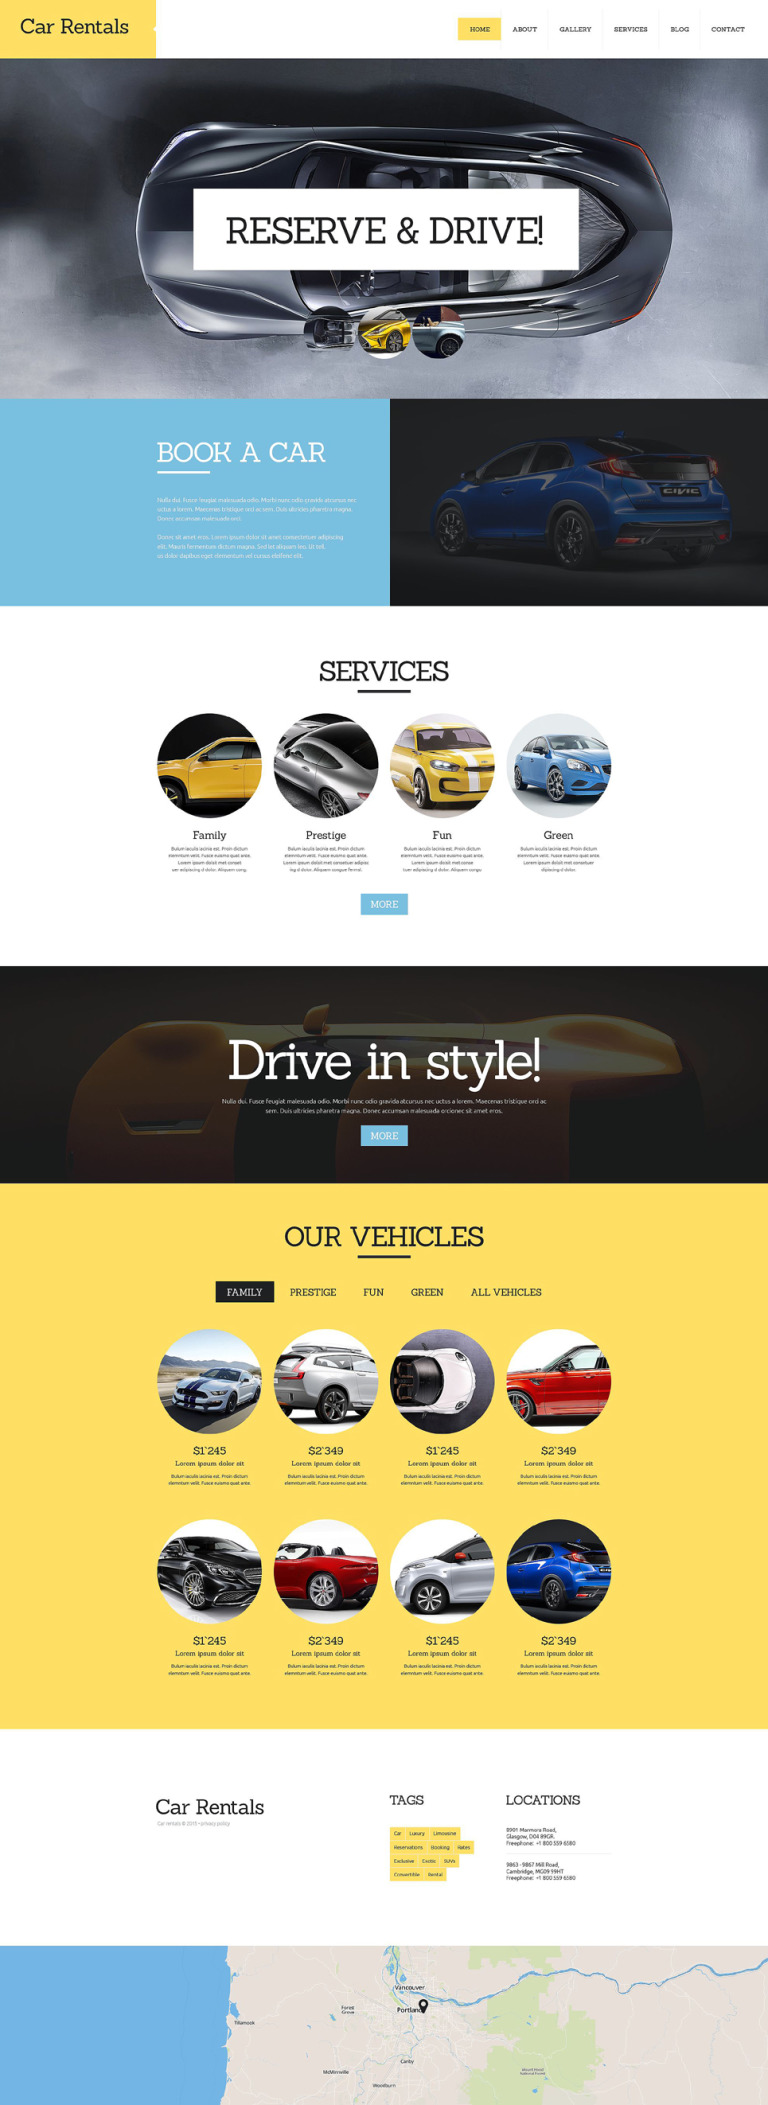 Car Rental Joomla Template New Screenshots BIG